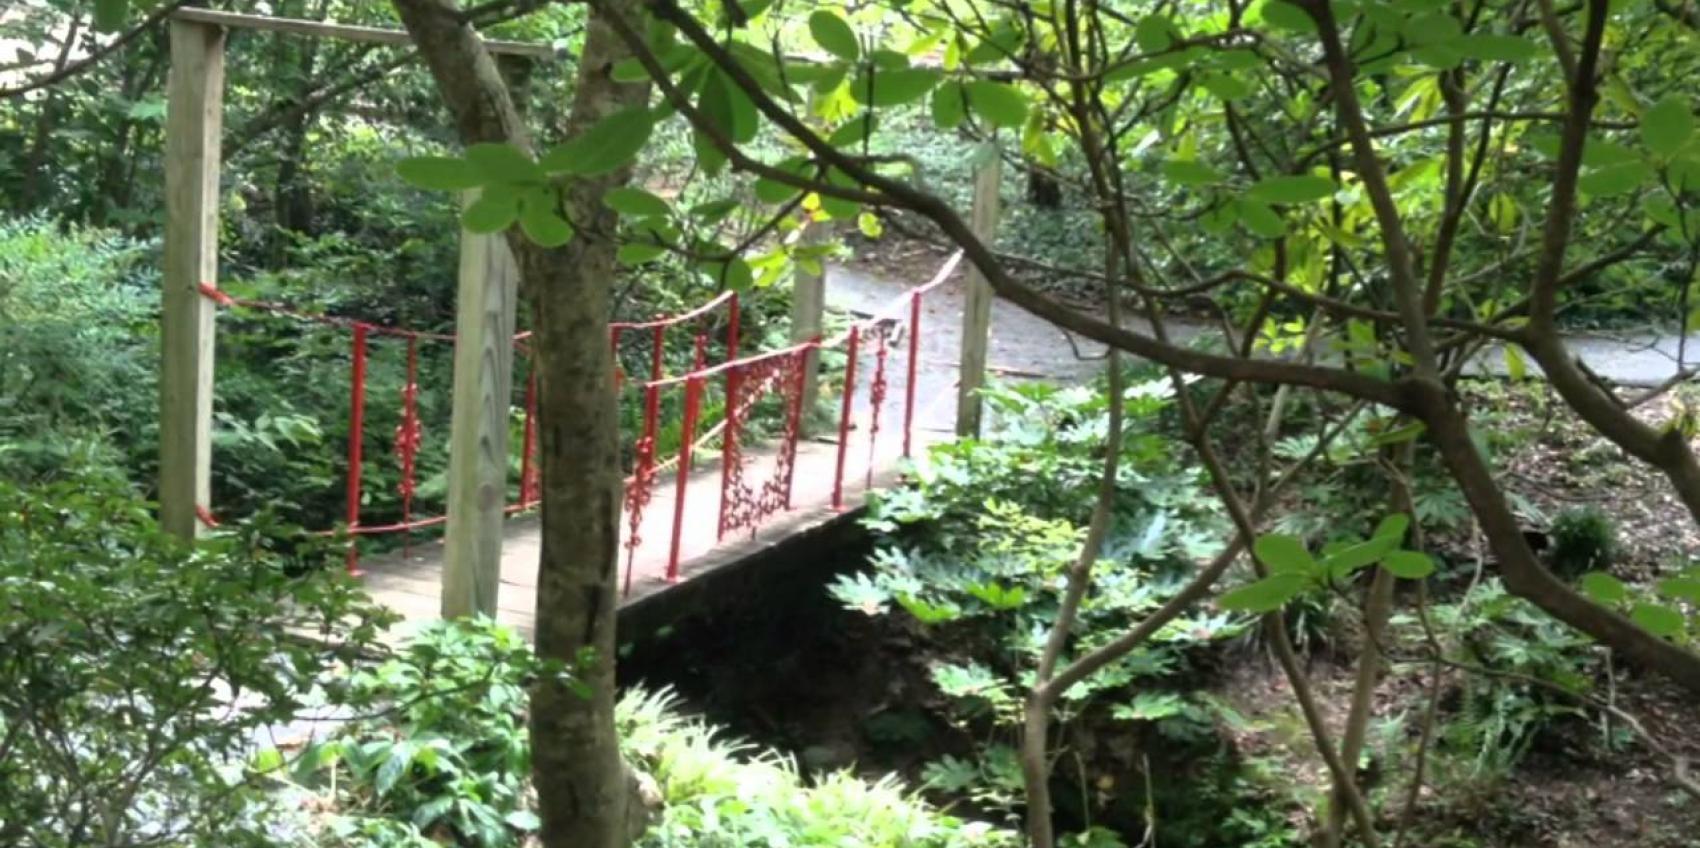 Ordinaire American Public Gardens Association